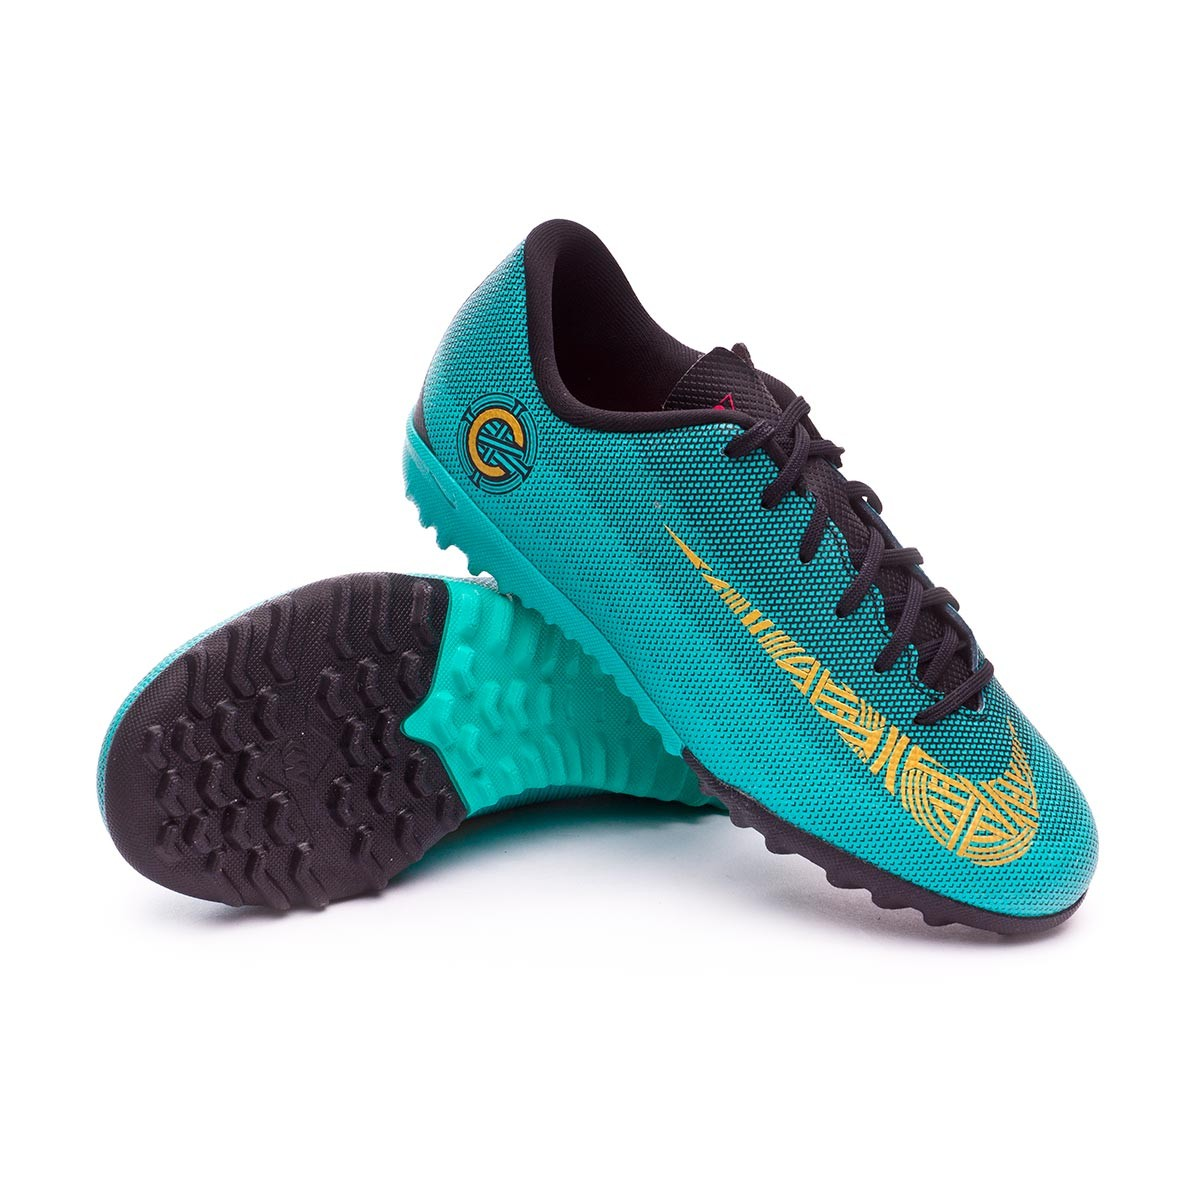 7ed23faf61162 Zapatilla Nike Mercurial VaporX XII Academy GS CR7 Turf Niño Clear  jade-Metallic vivid gold-Black - Tienda de fútbol Fútbol Emotion